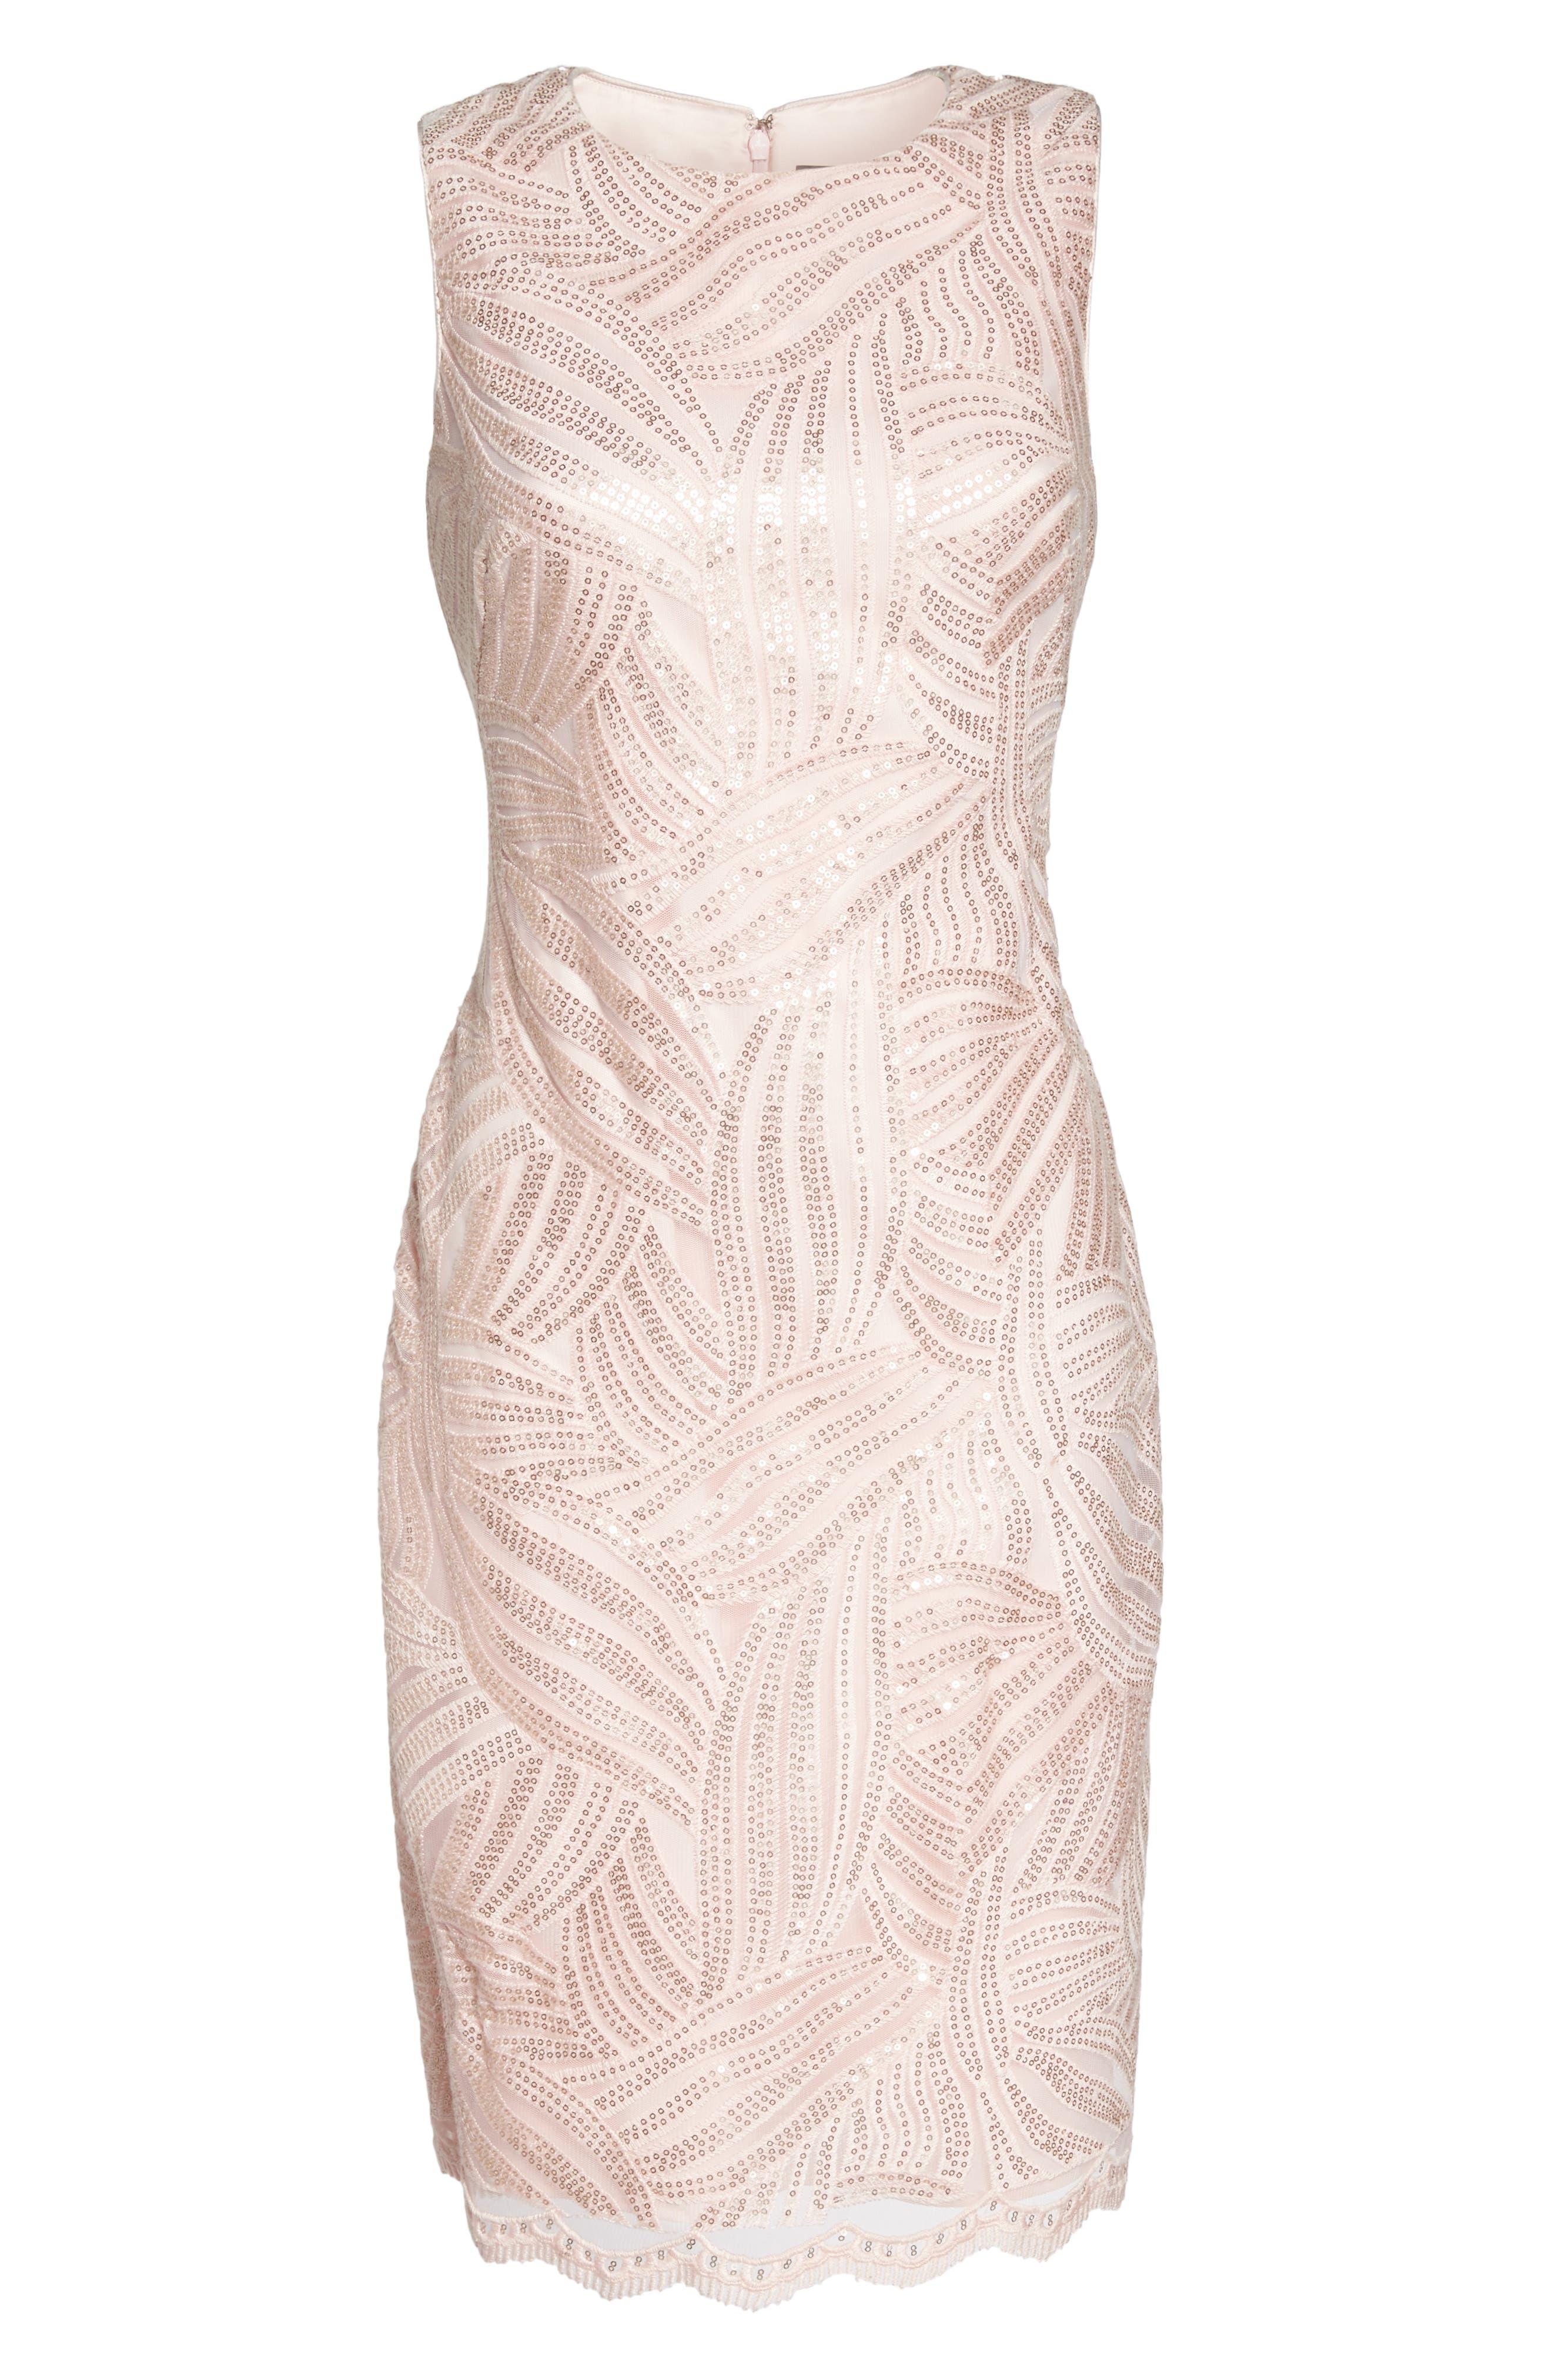 Sleeveless Sequin Sheath Dress,                             Alternate thumbnail 6, color,                             Light Pink